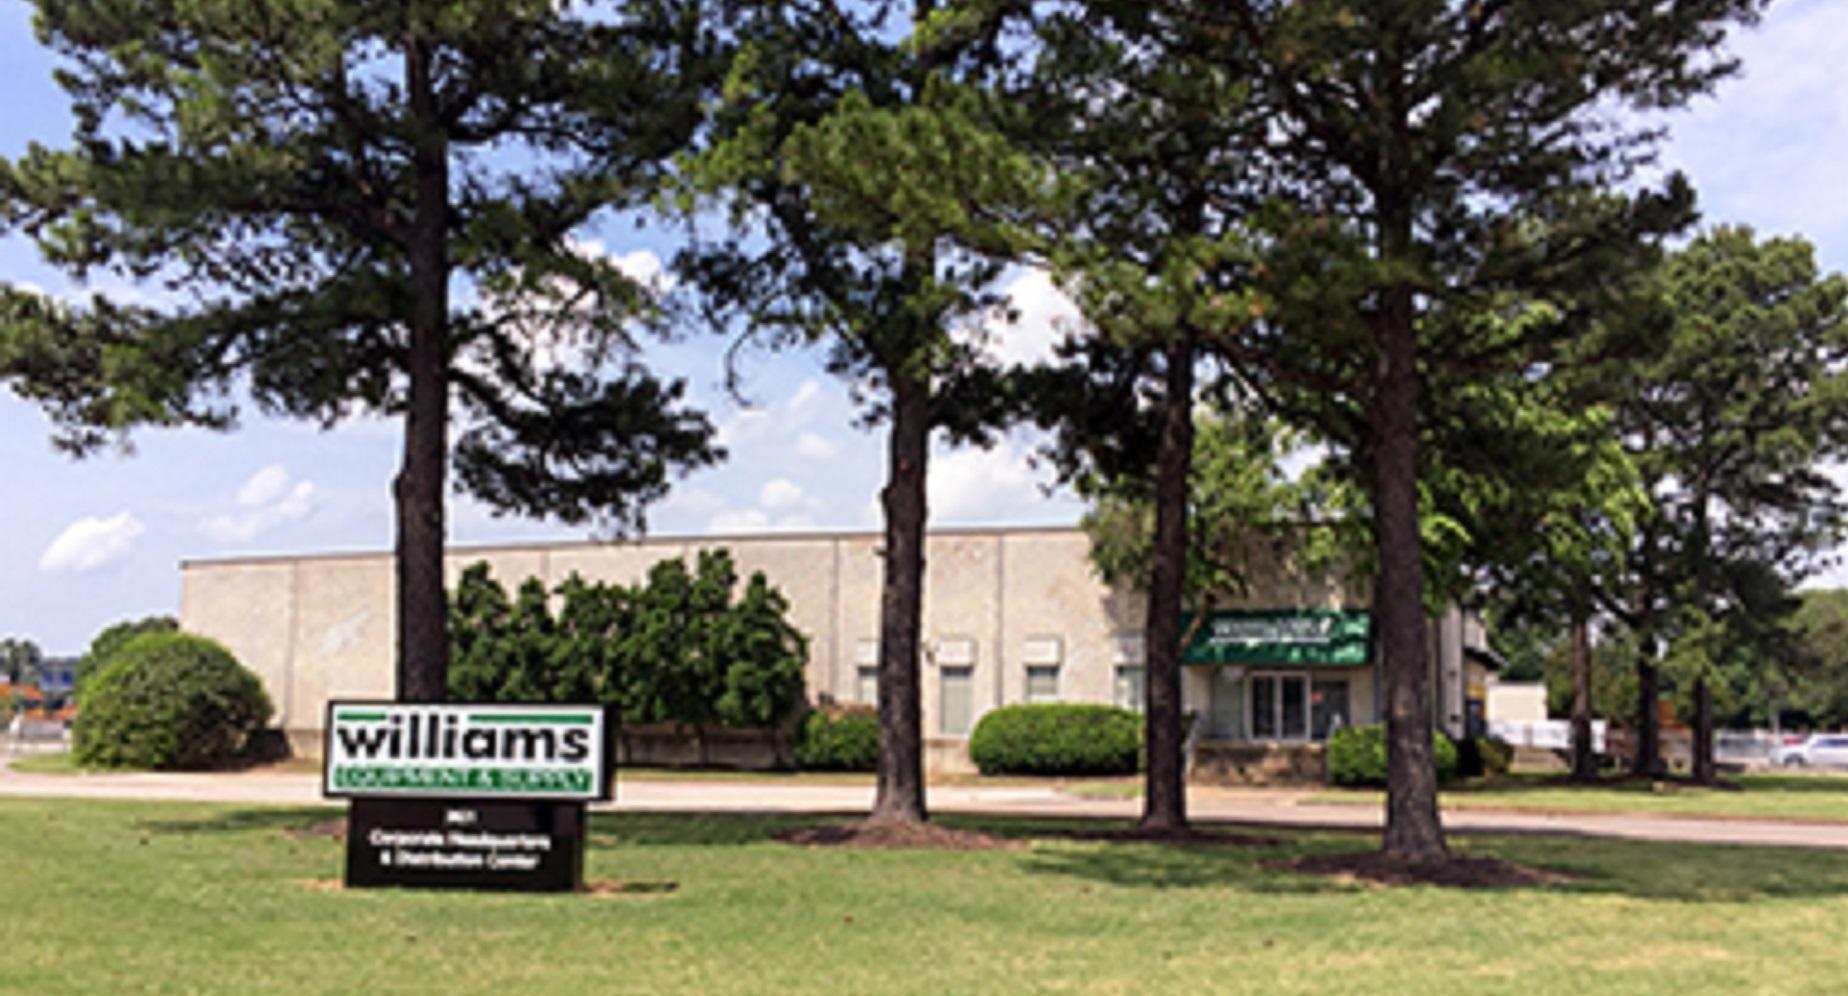 Williams Equipment & Supply